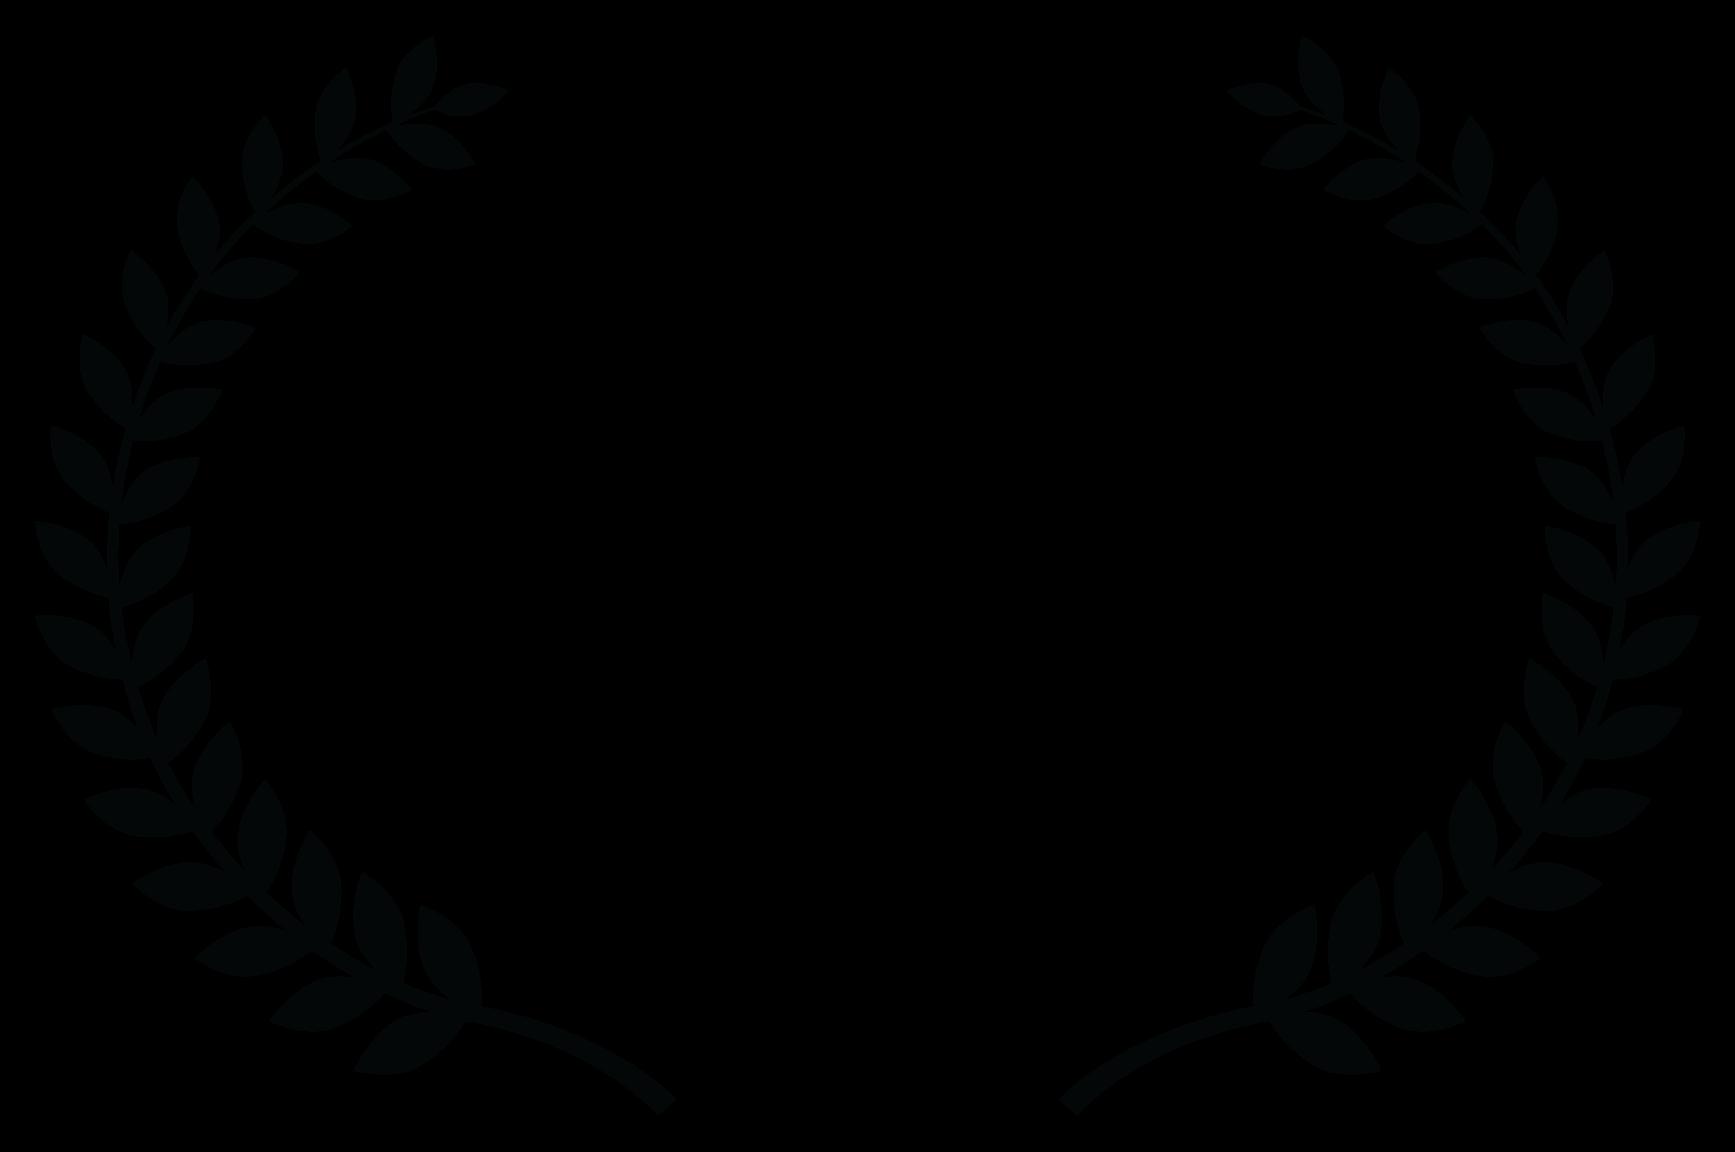 OFFICIAL SELECTION - Best of Latin America Short Film Festival - 2020